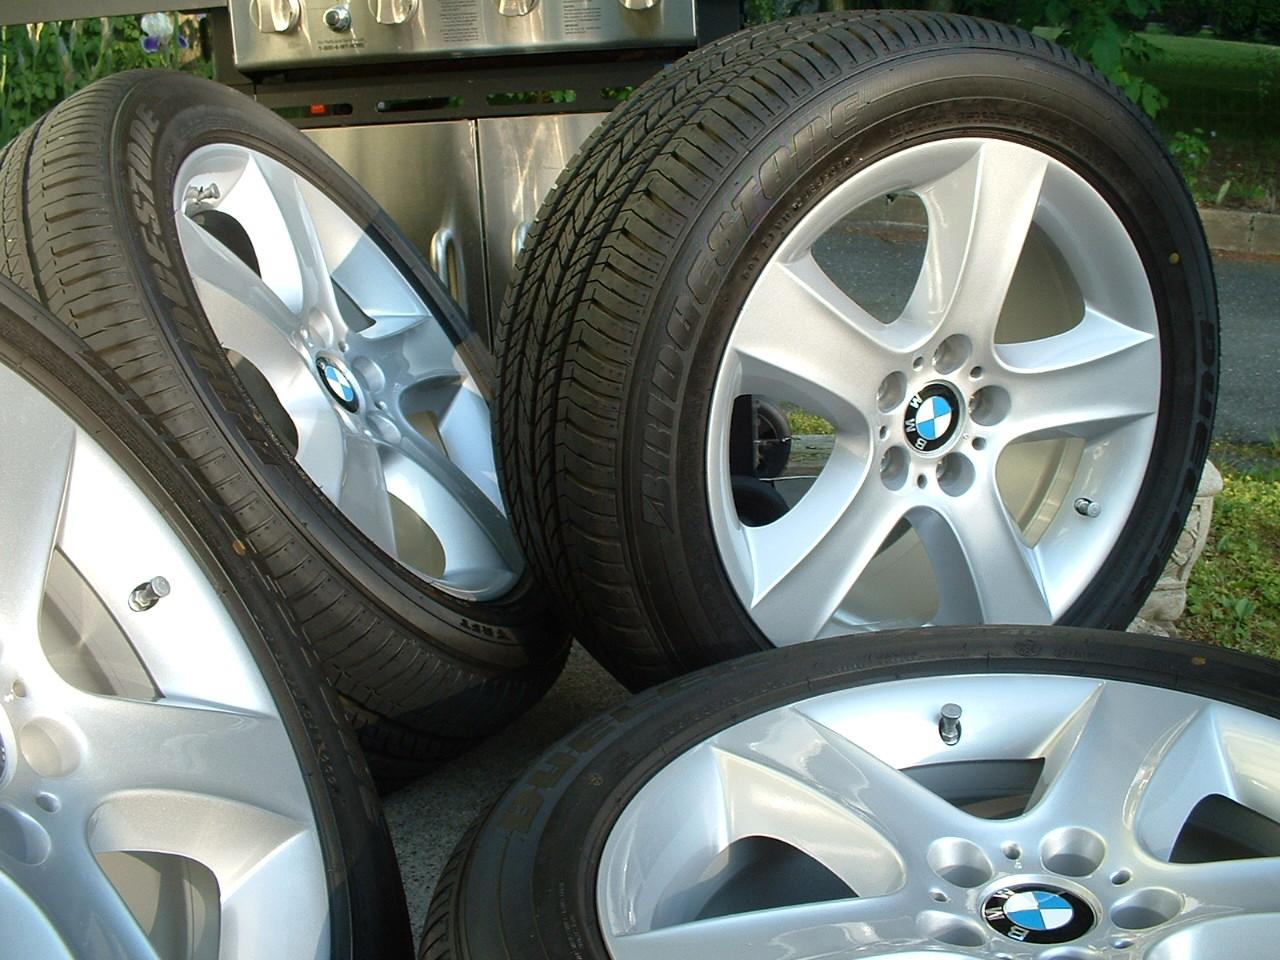 New 2010 Bmw X5 19 Quot Wheels Tires Amp Tpms